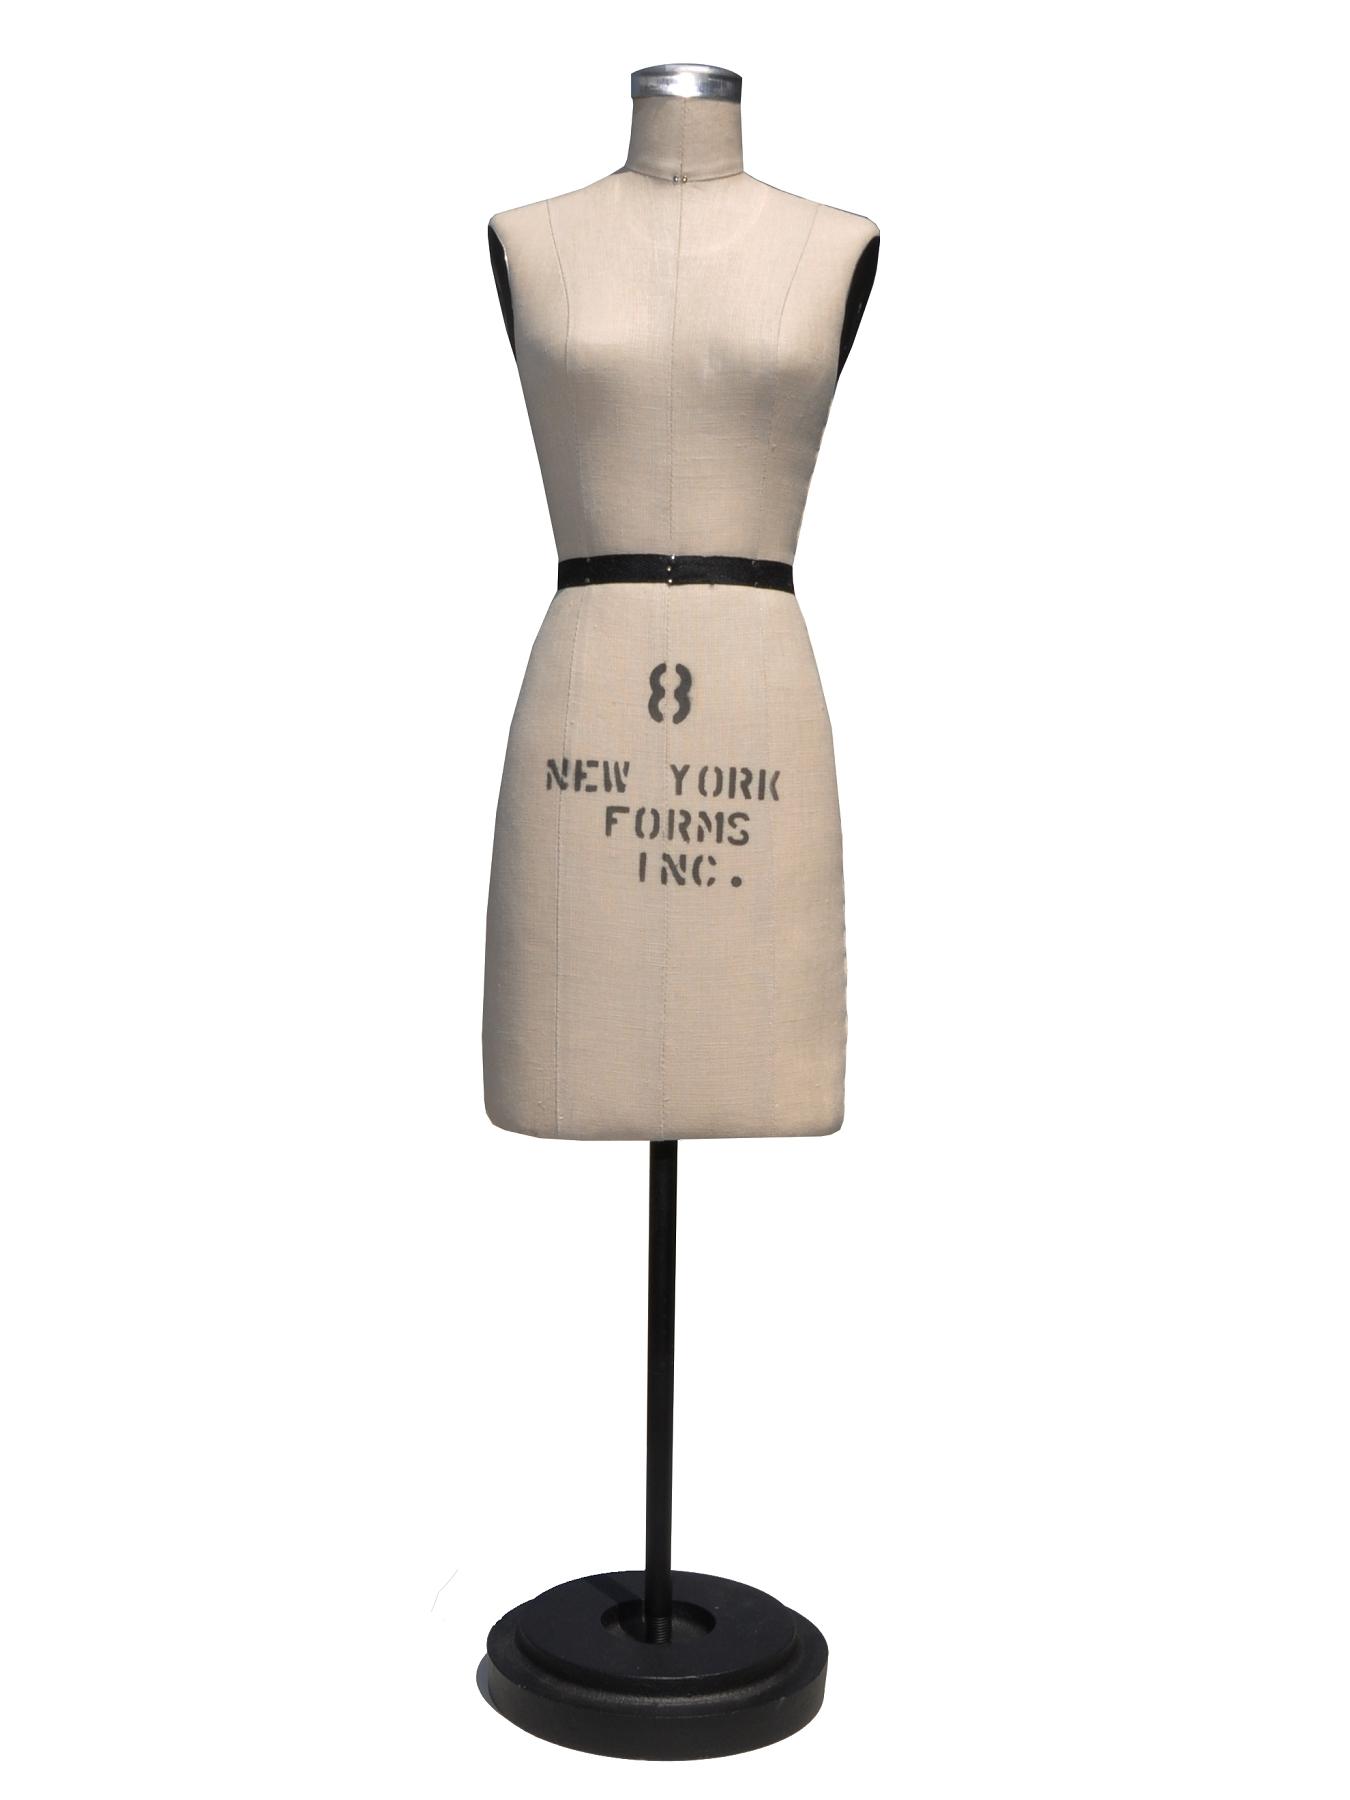 New York Half Size Dress Form